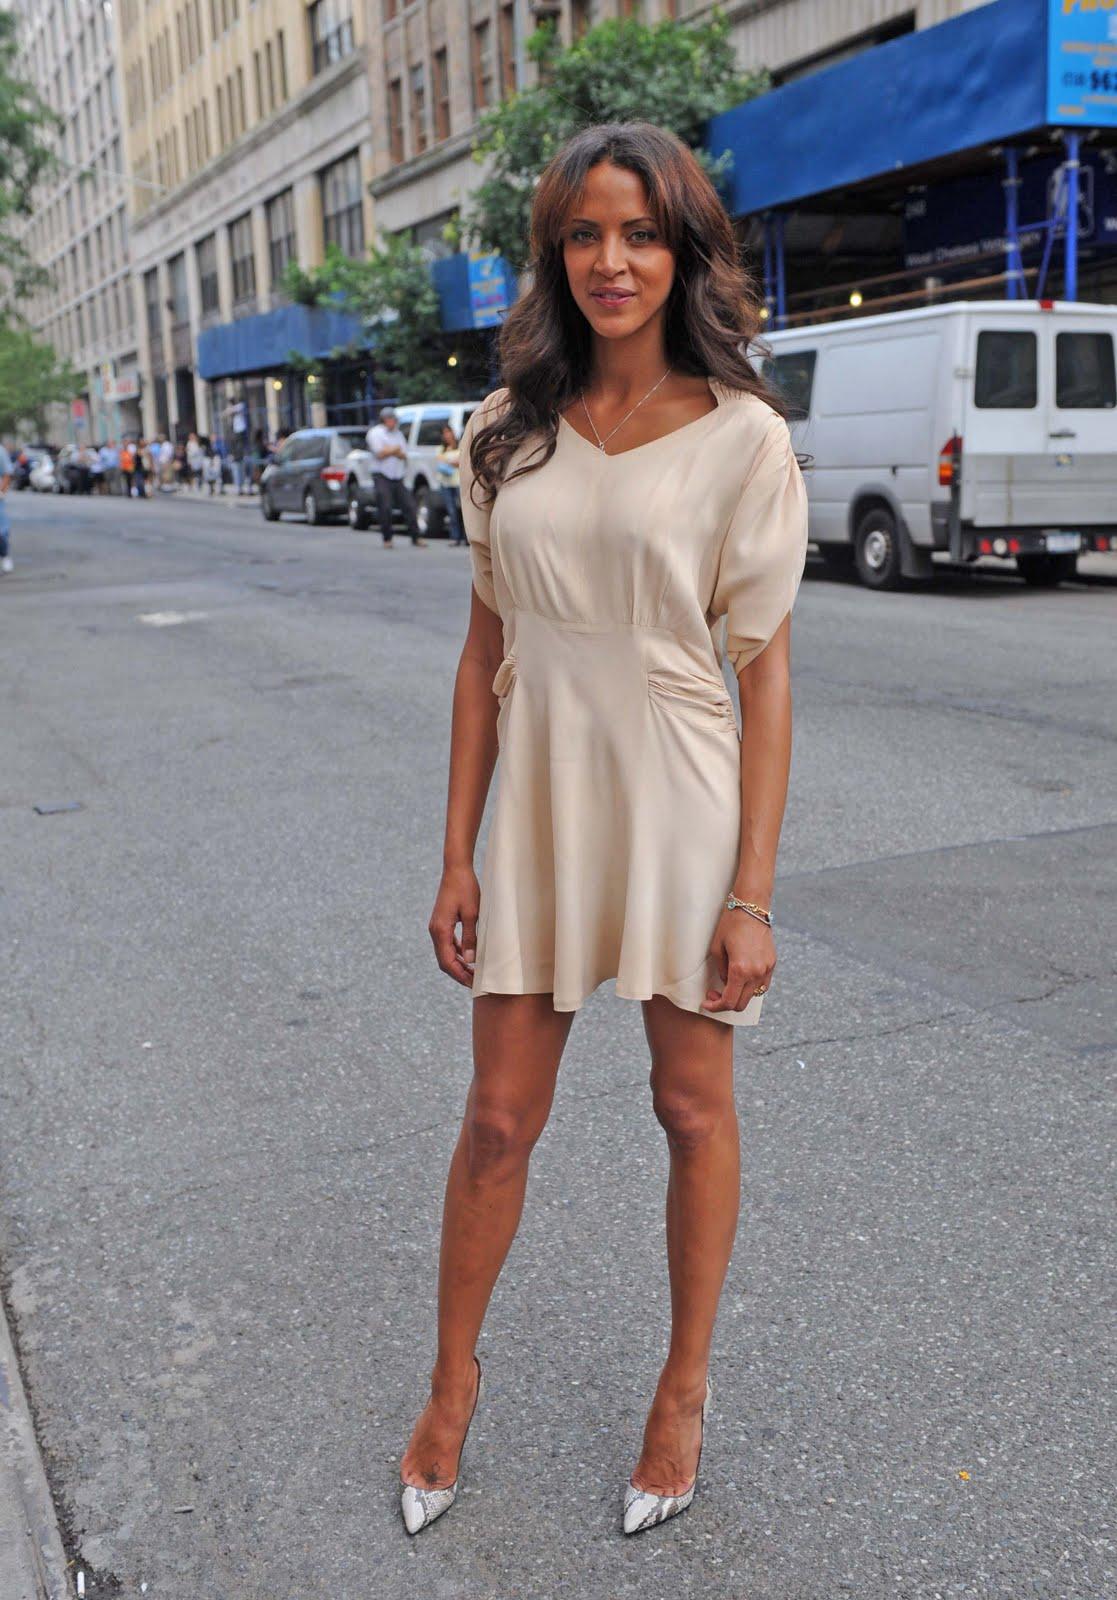 V Banks Model The Toe Cleavage Blog:...